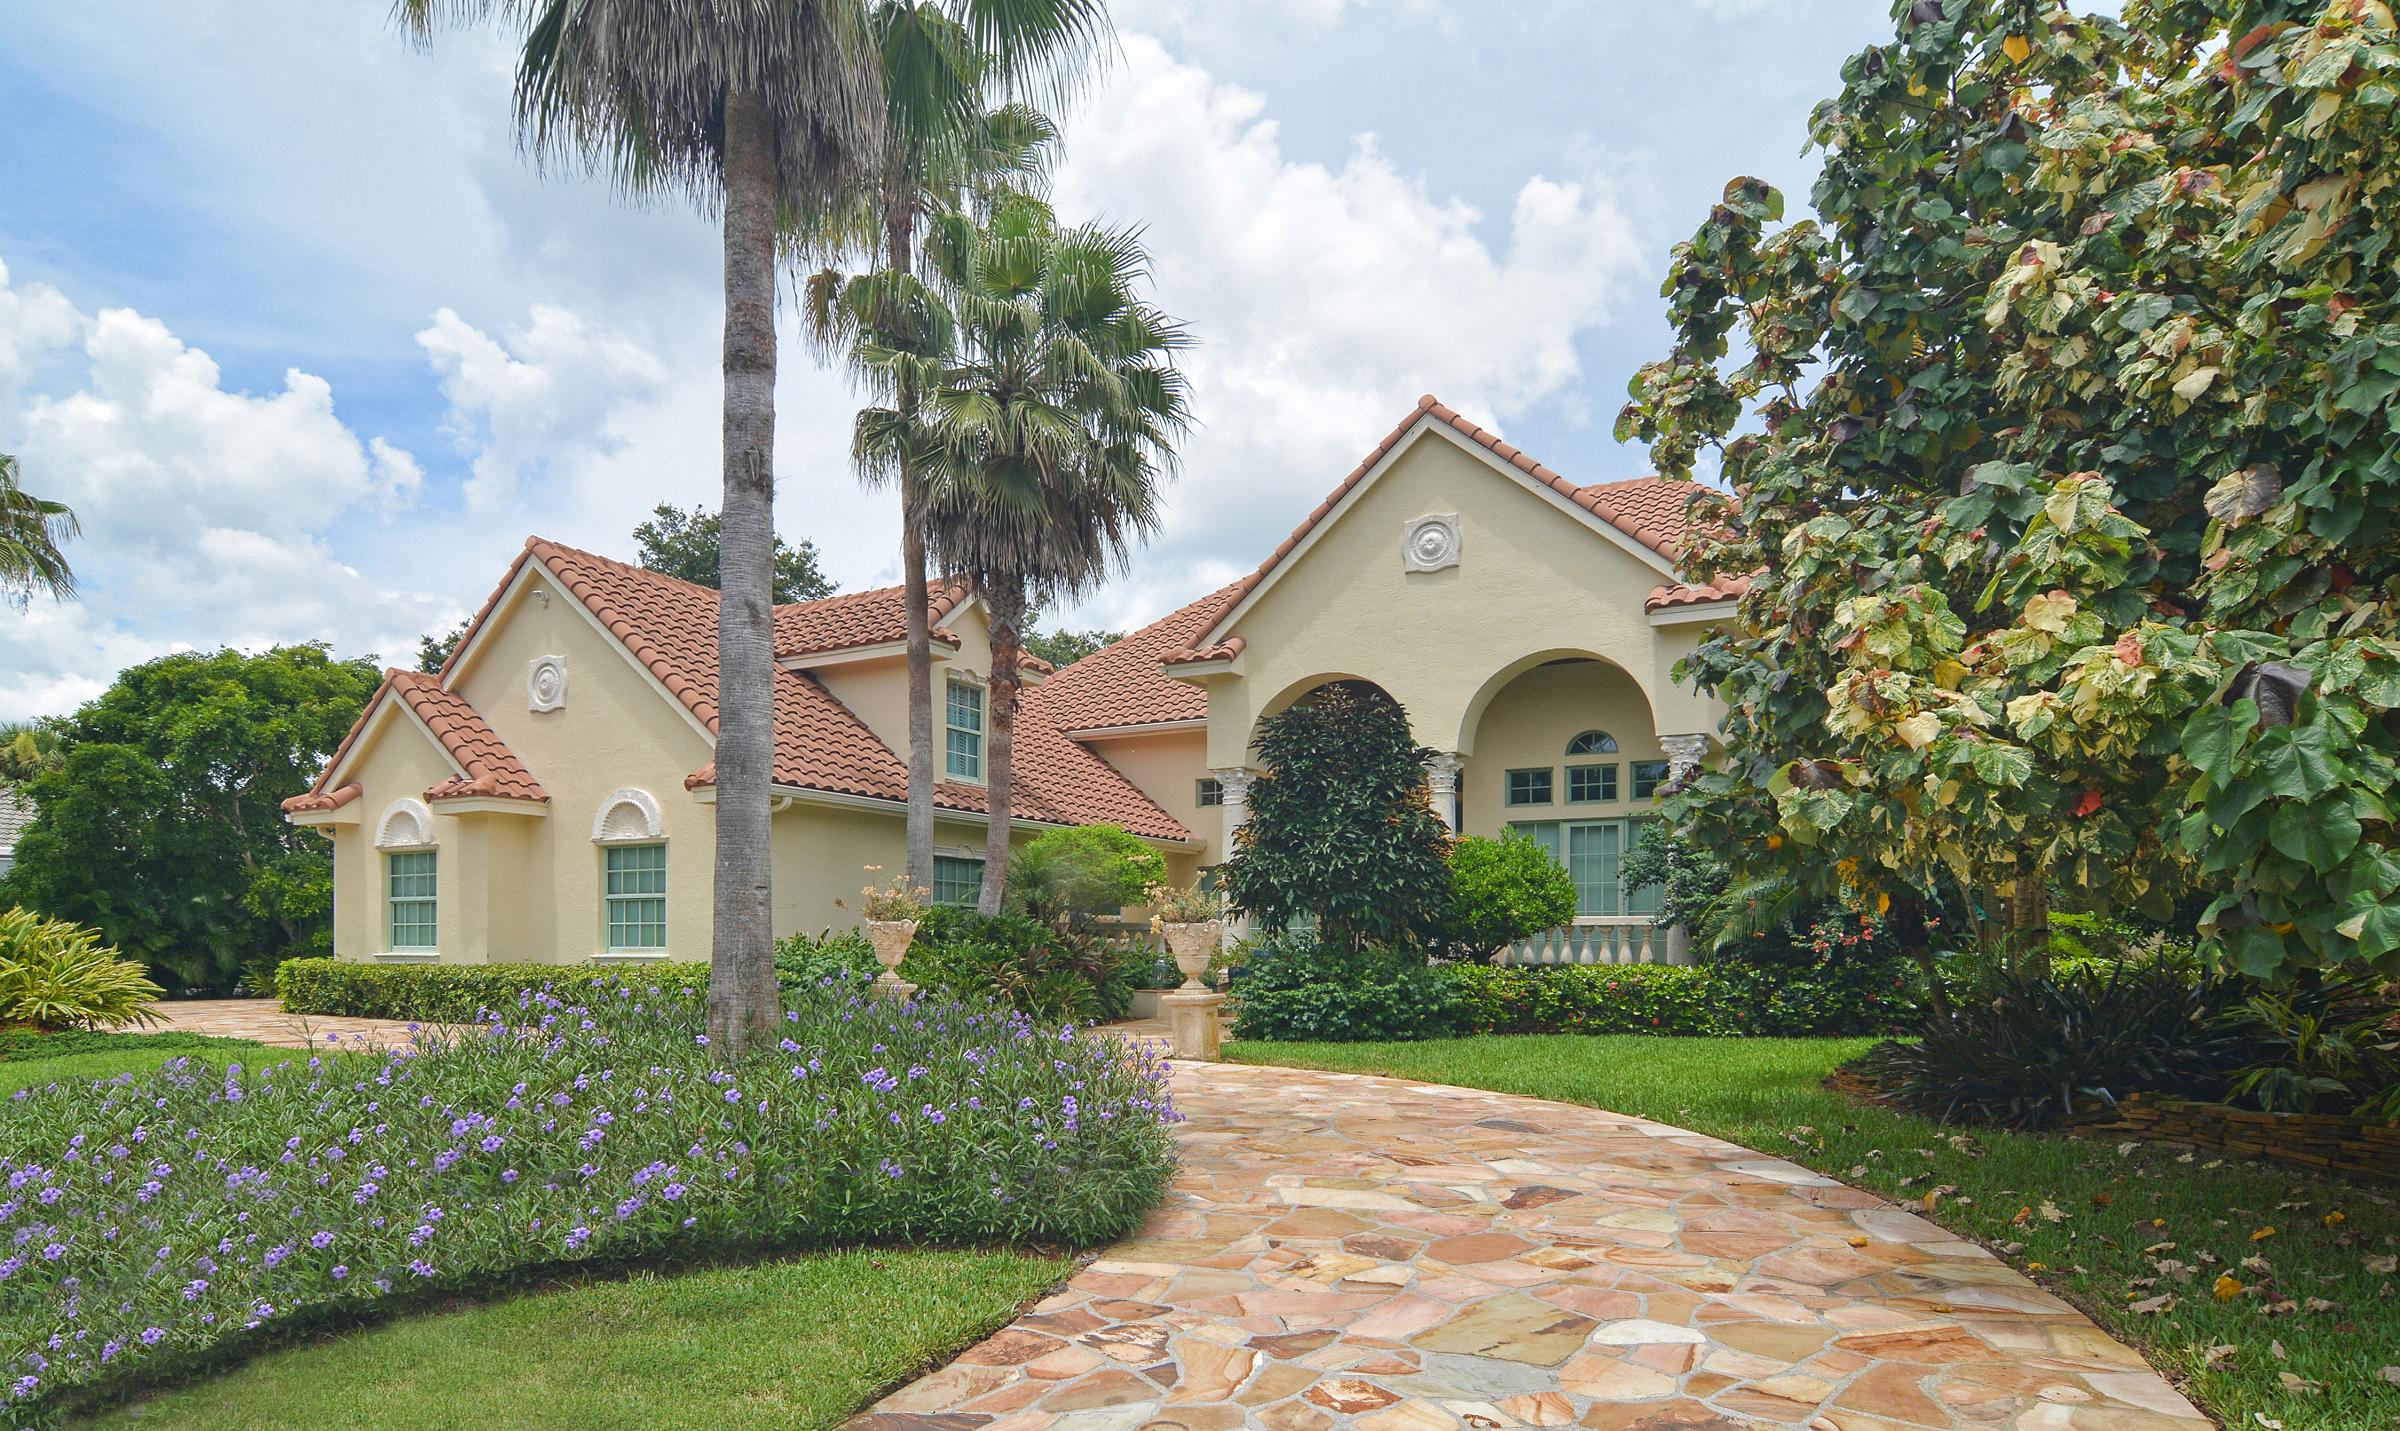 Single Family Home for Sale at 5921 Whitetail Lane Jupiter, Florida, 33458 United States